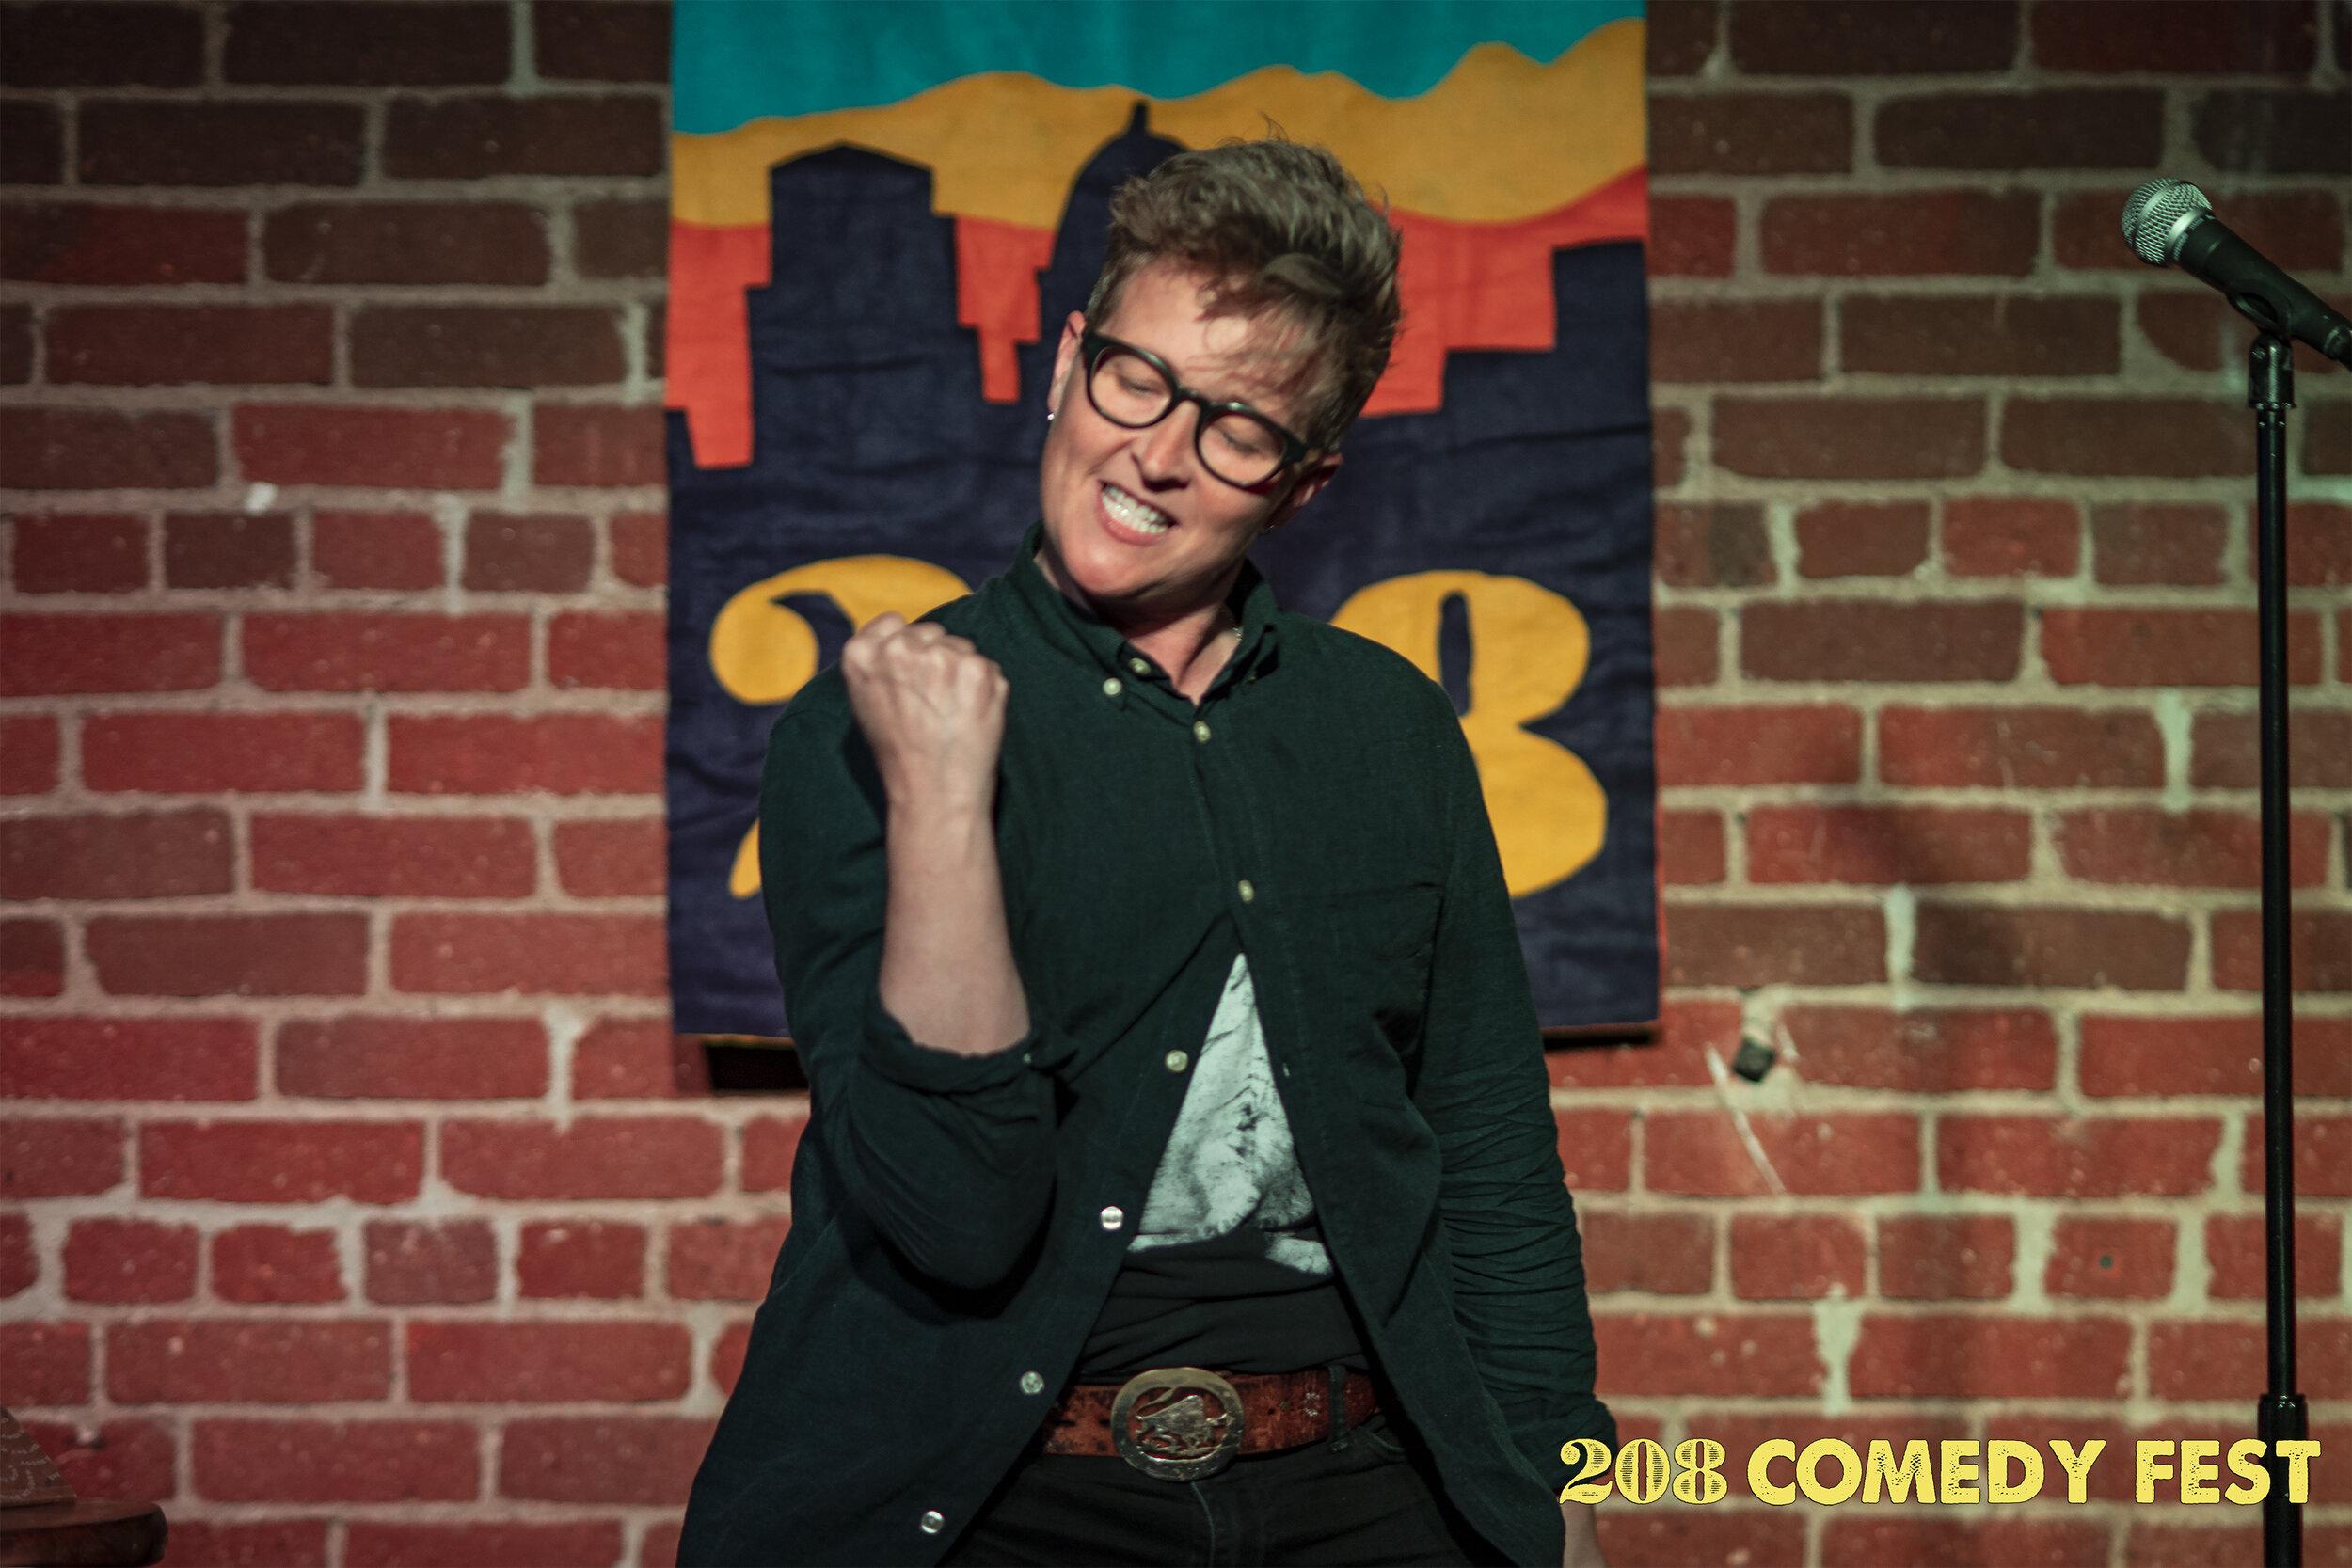 Comedyfest 24.jpg